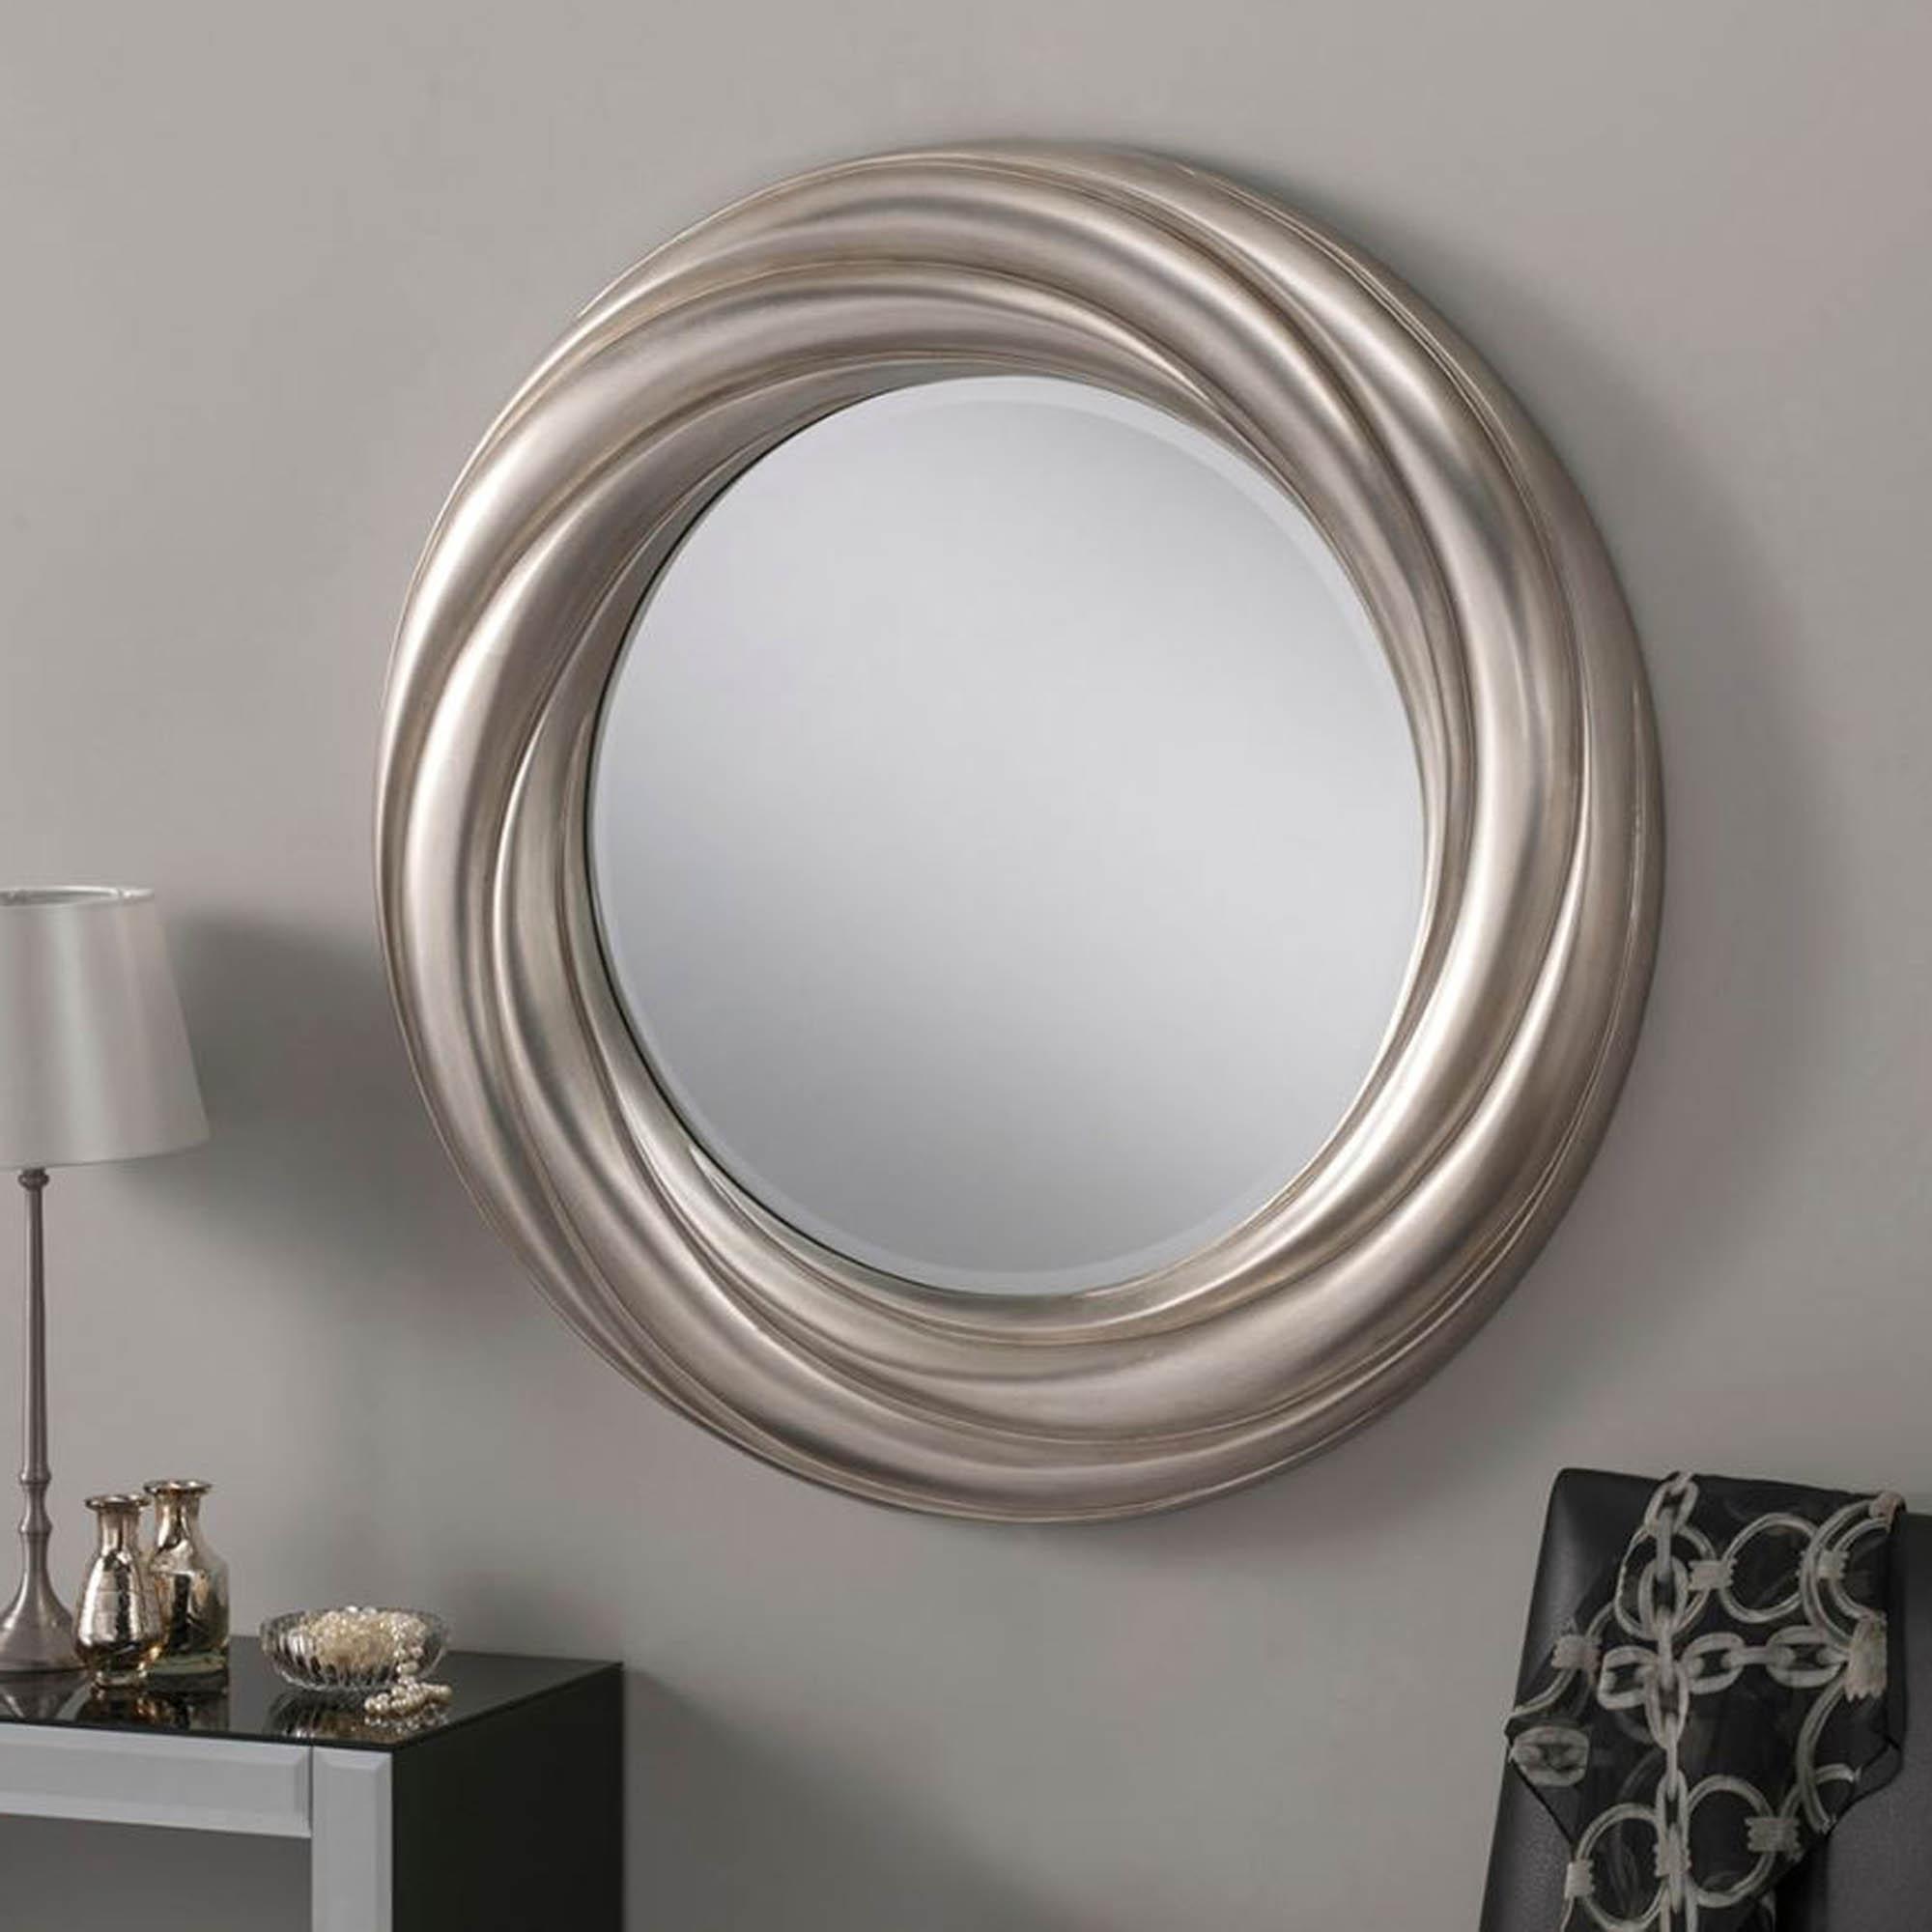 Trendy Swirl Silver Modern Wall Mirror Regarding Swirl Wall Mirrors (View 4 of 20)